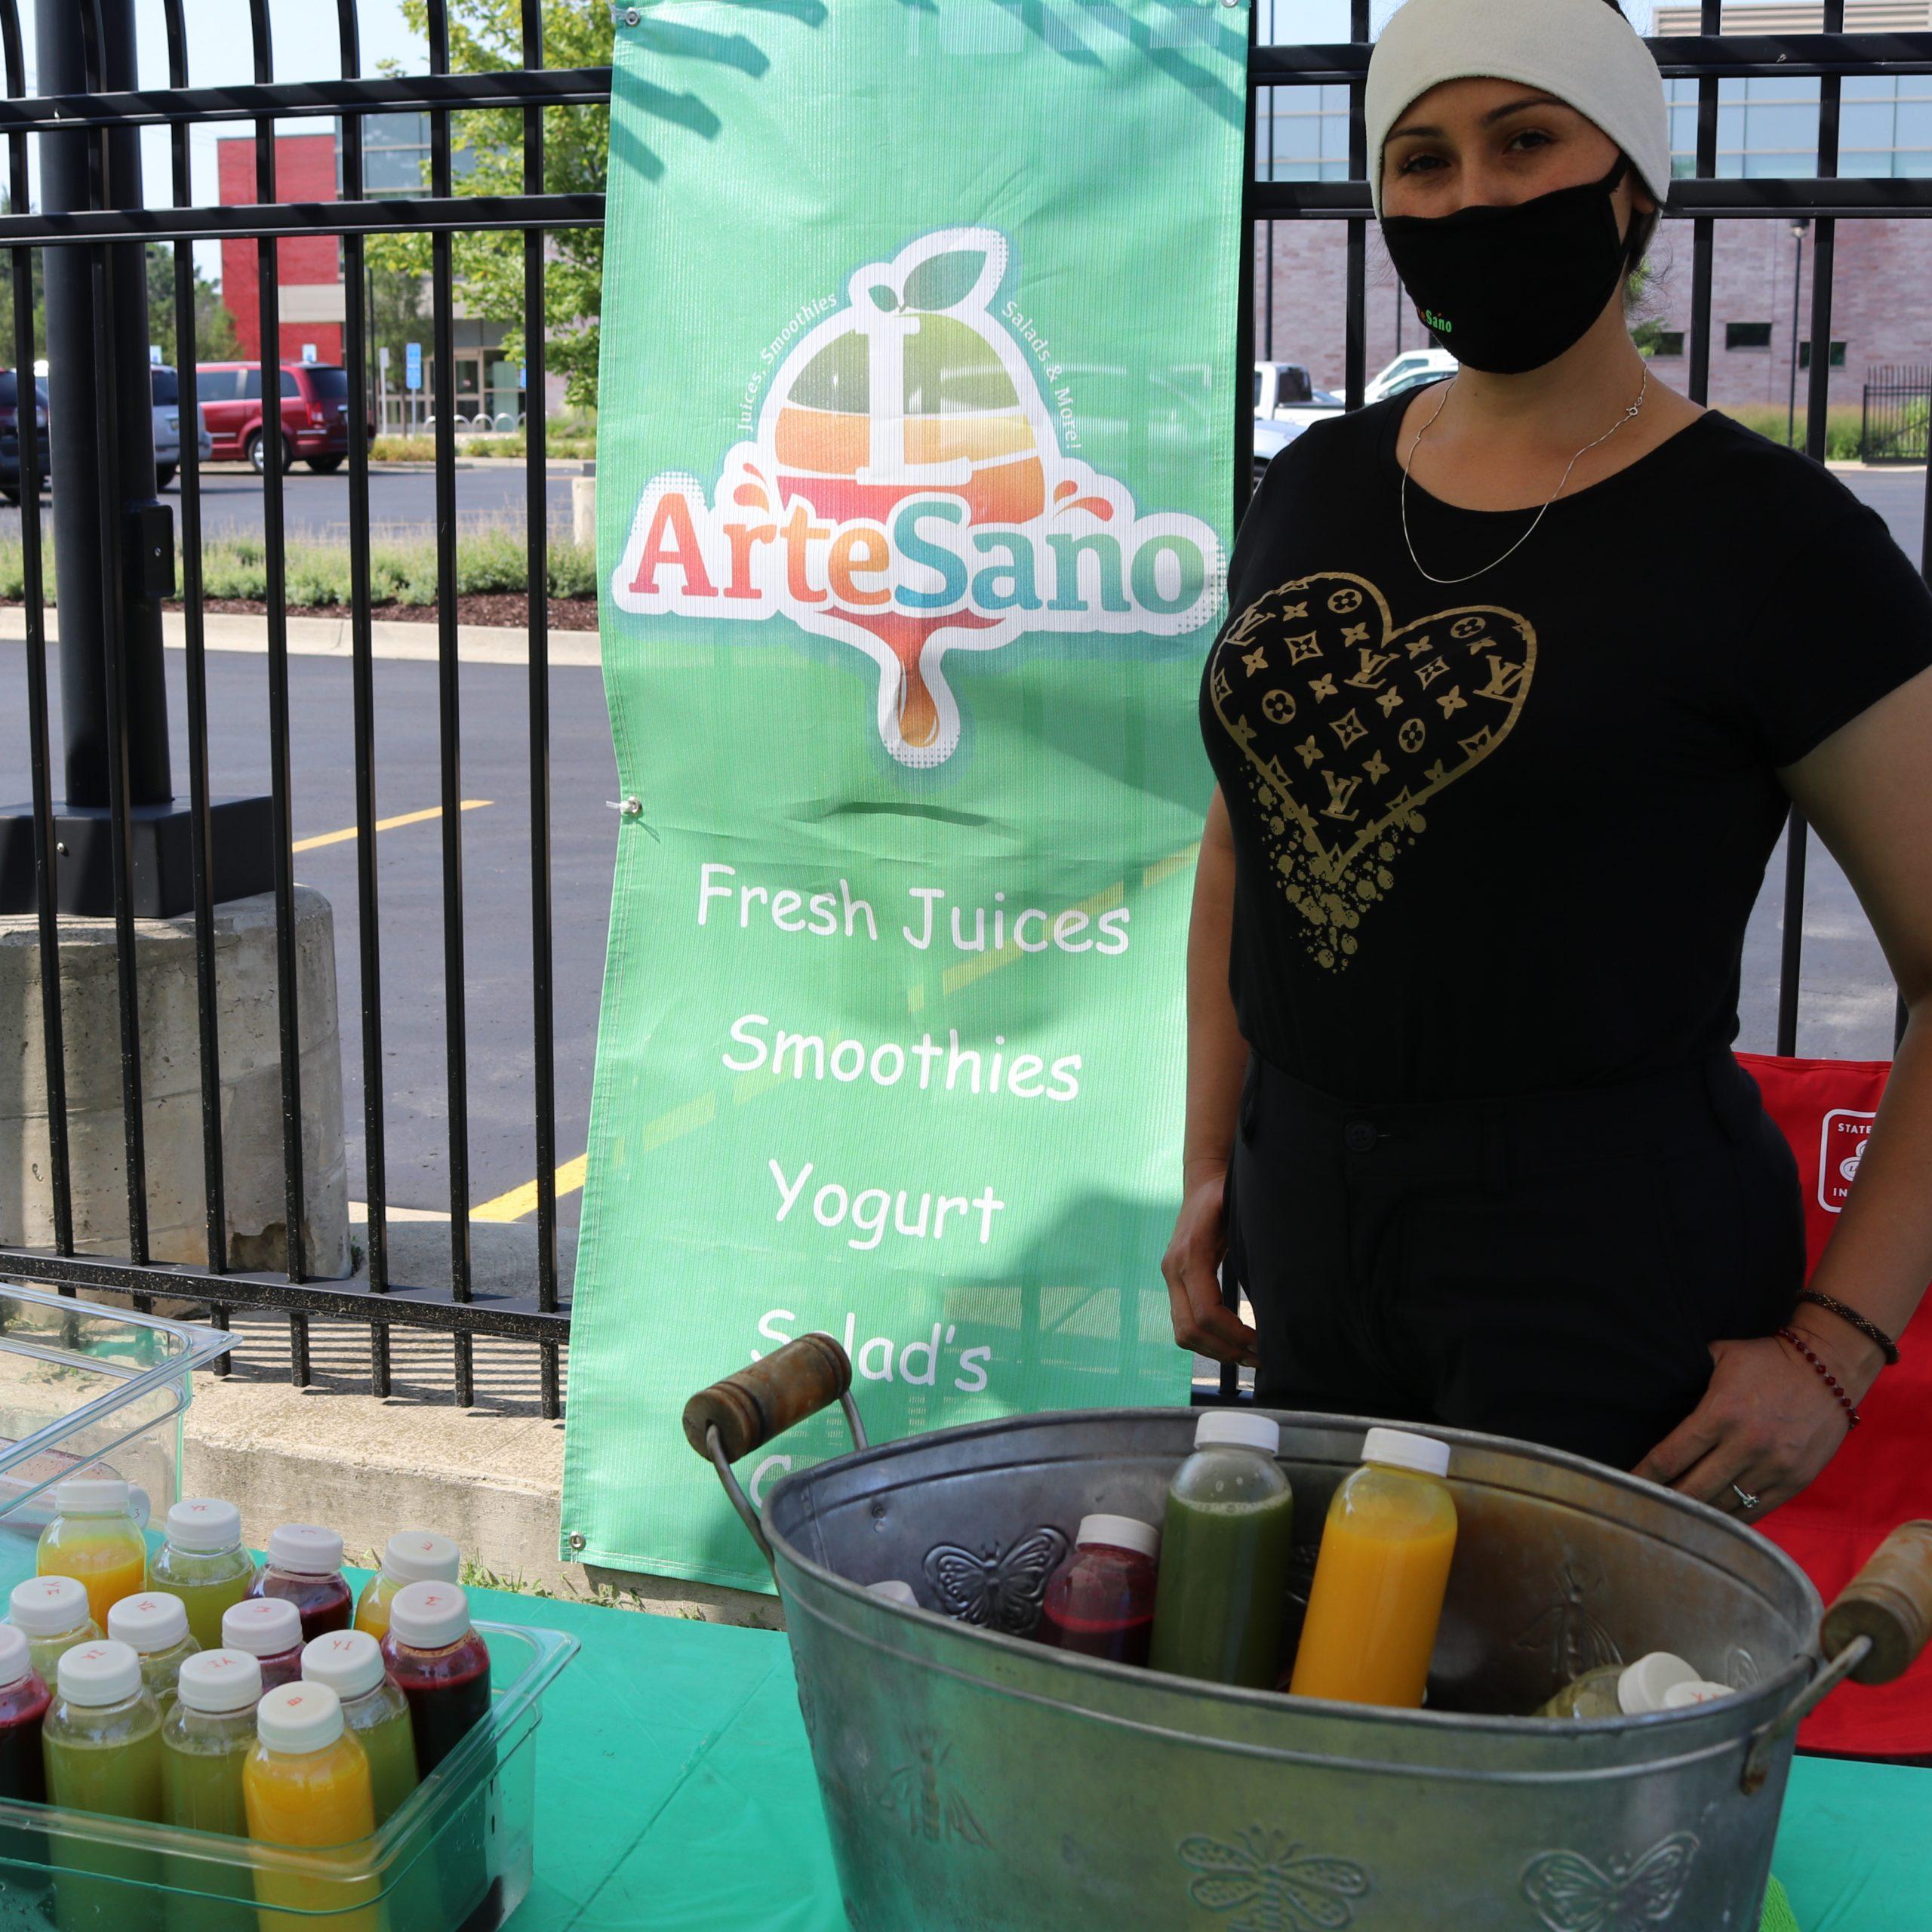 Artesano Juices